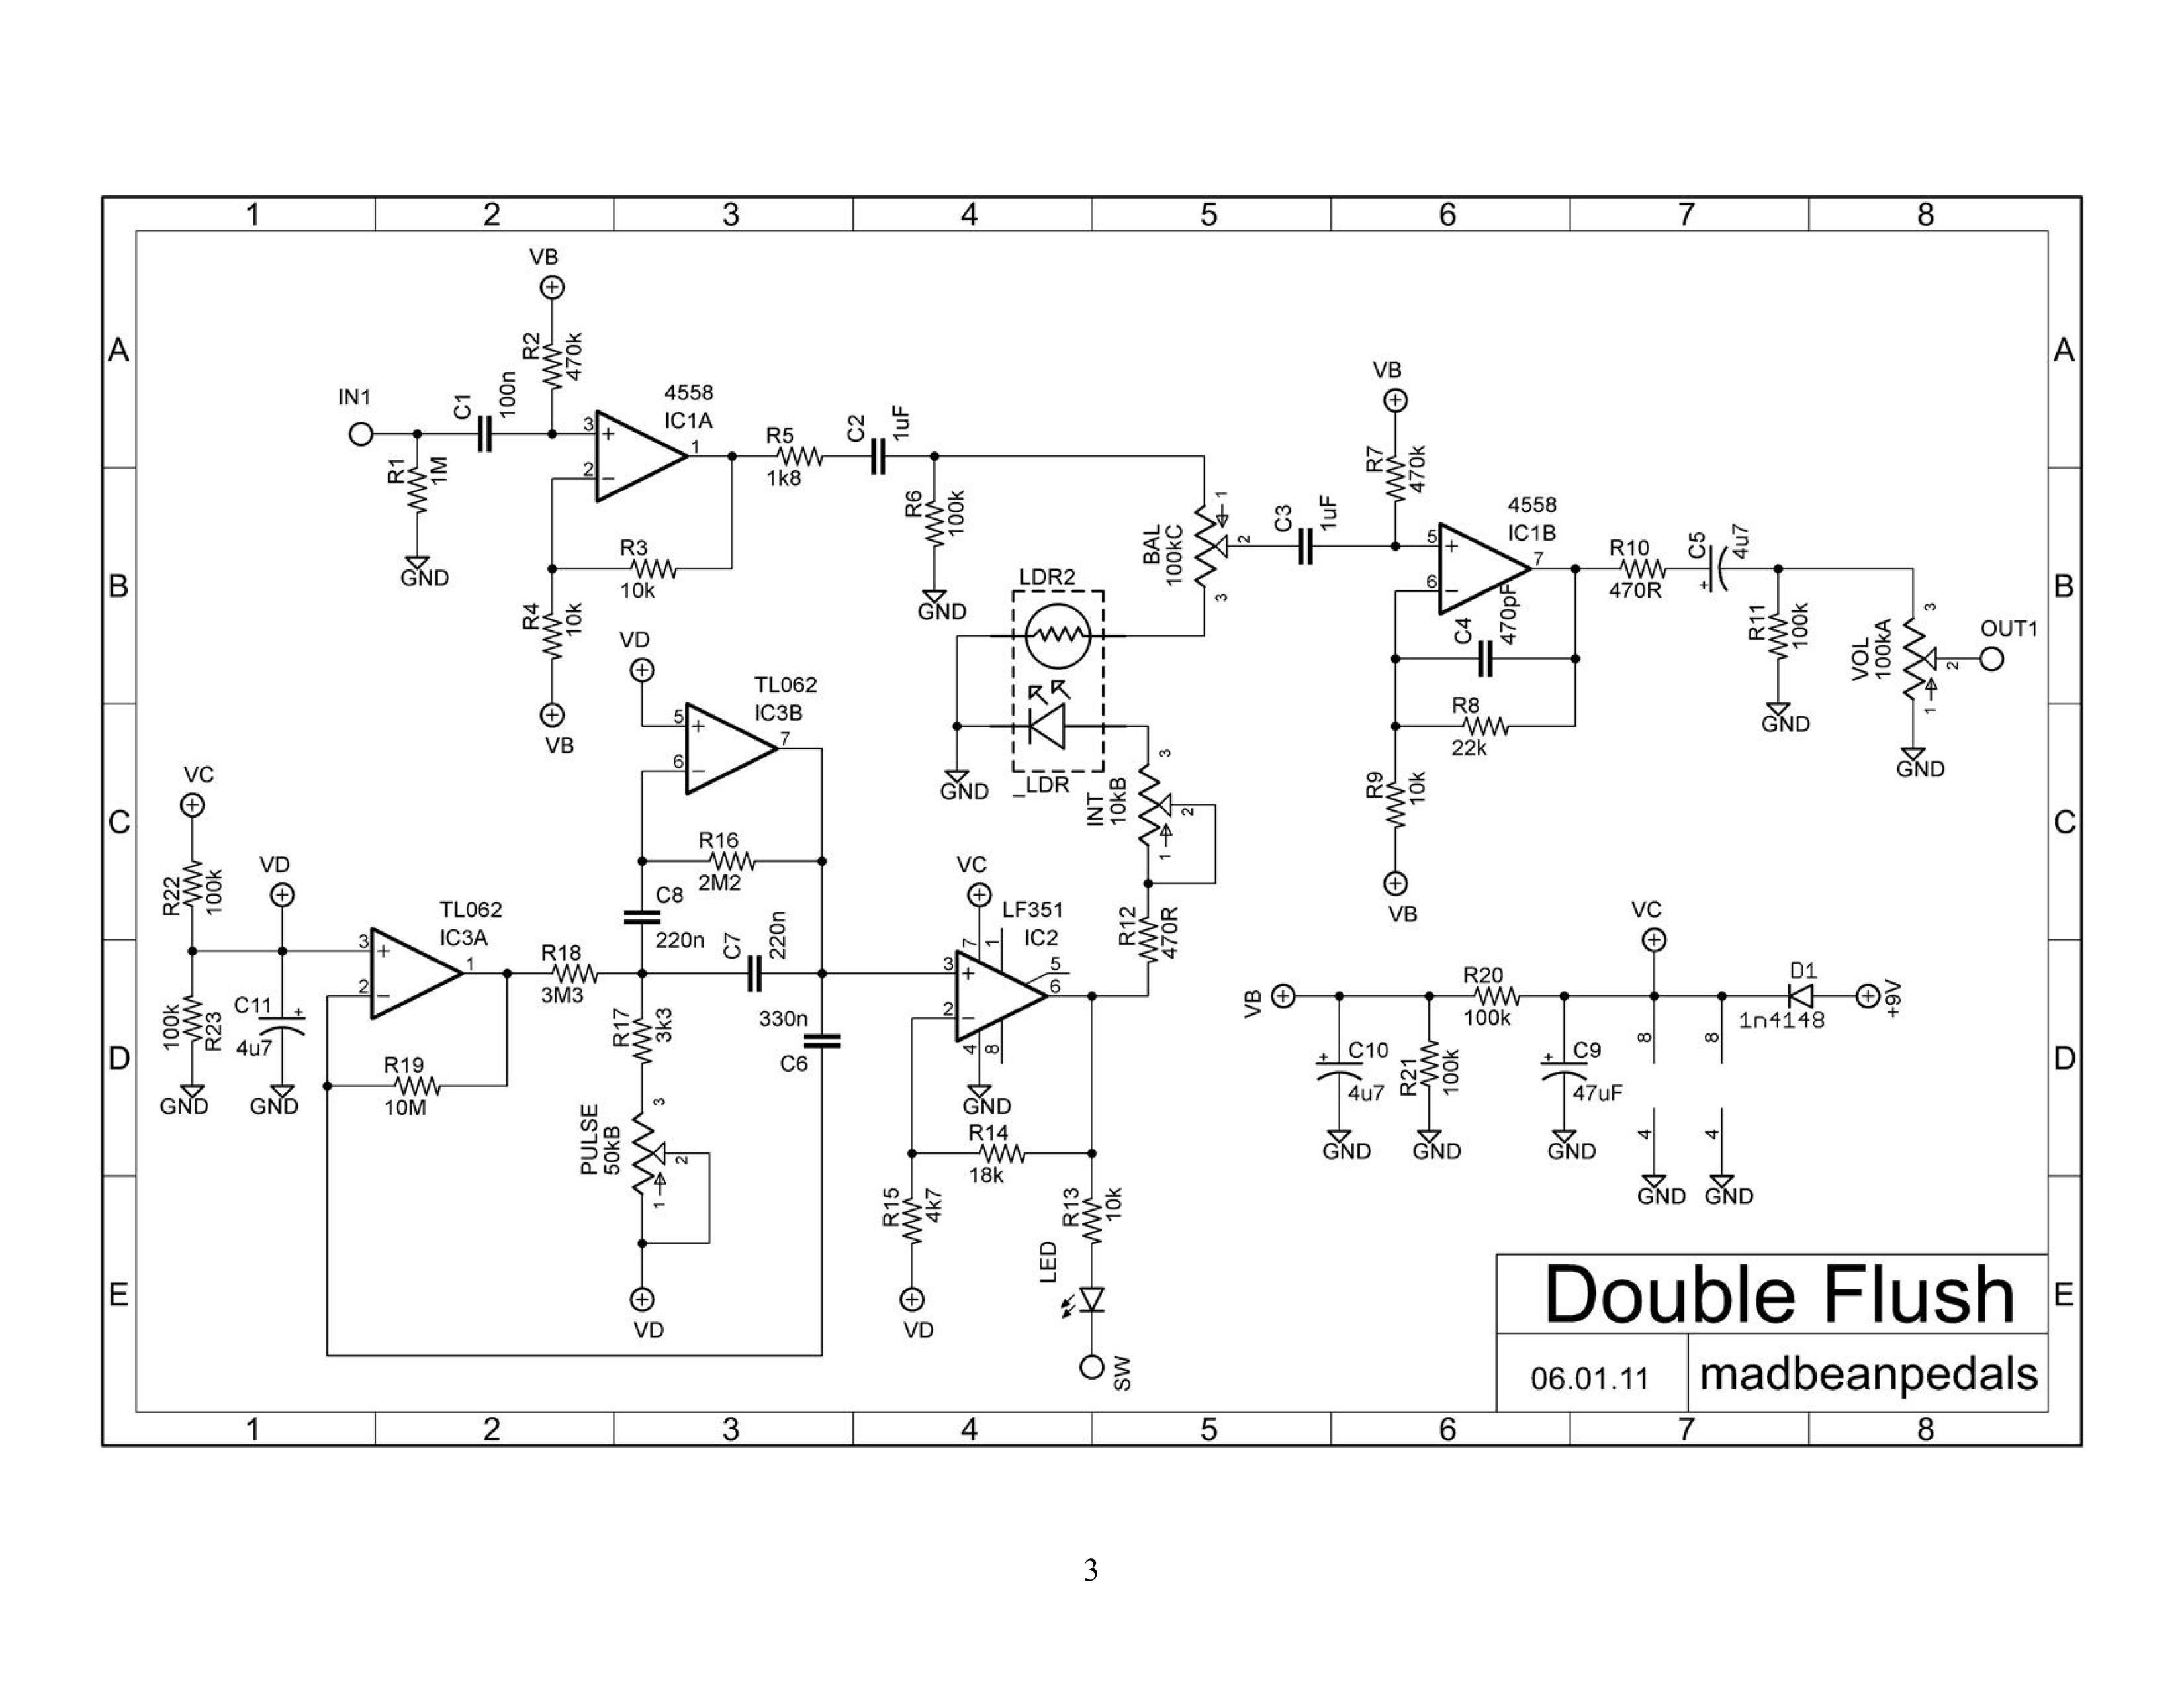 DoubleVibe Double_Flush